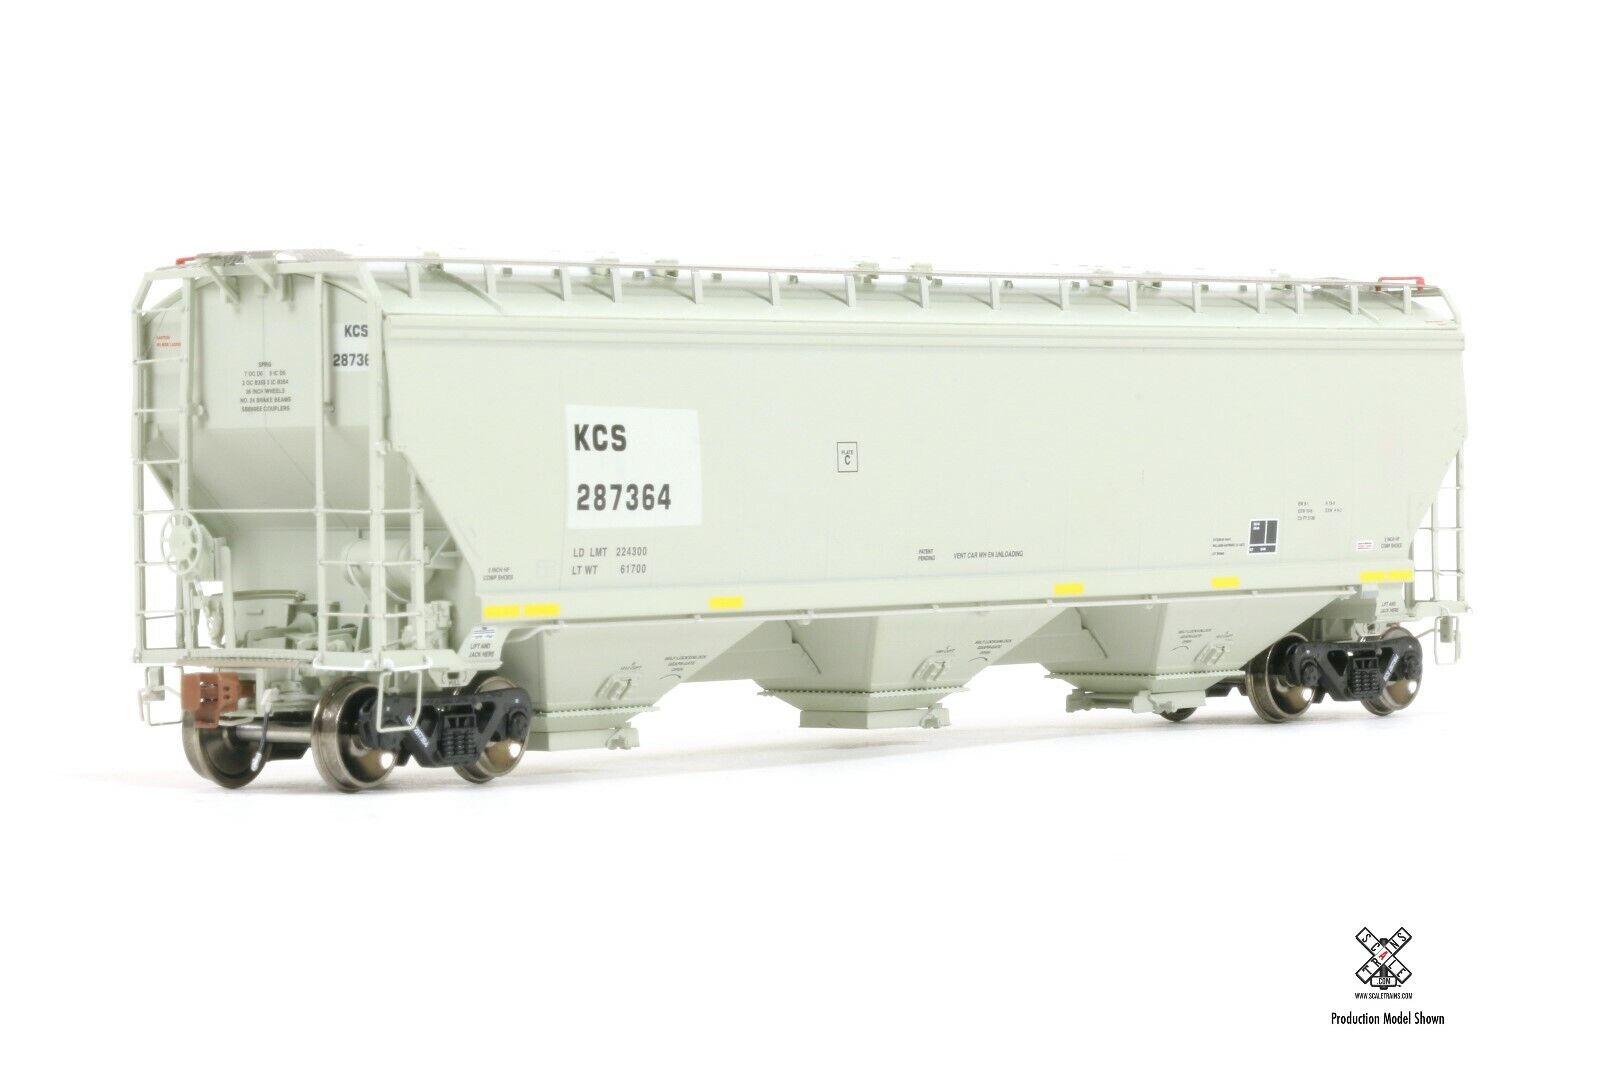 SCALETRAINS HO SXT31580 Gunderson 5188 Covered Hopper SOXX ex BNSF #484575